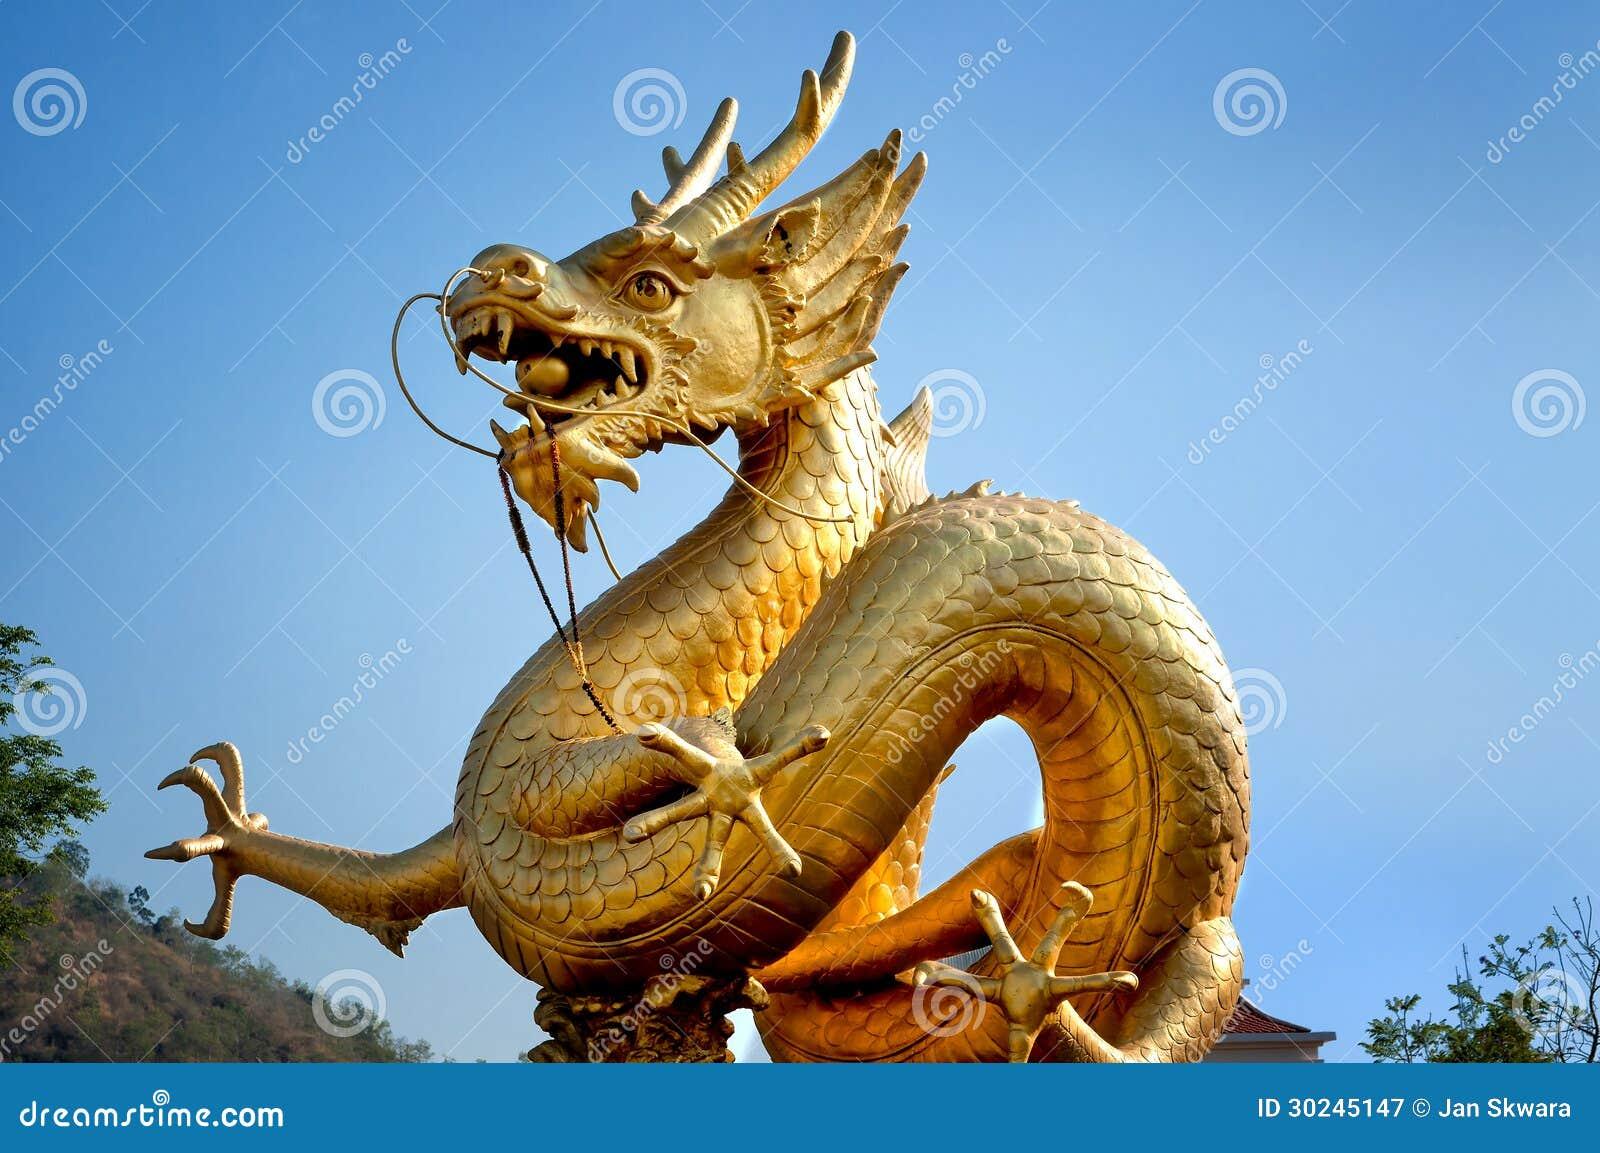 dragon d 39 or au dessus de ciel bleu image stock image du statue c l bration 30245147. Black Bedroom Furniture Sets. Home Design Ideas